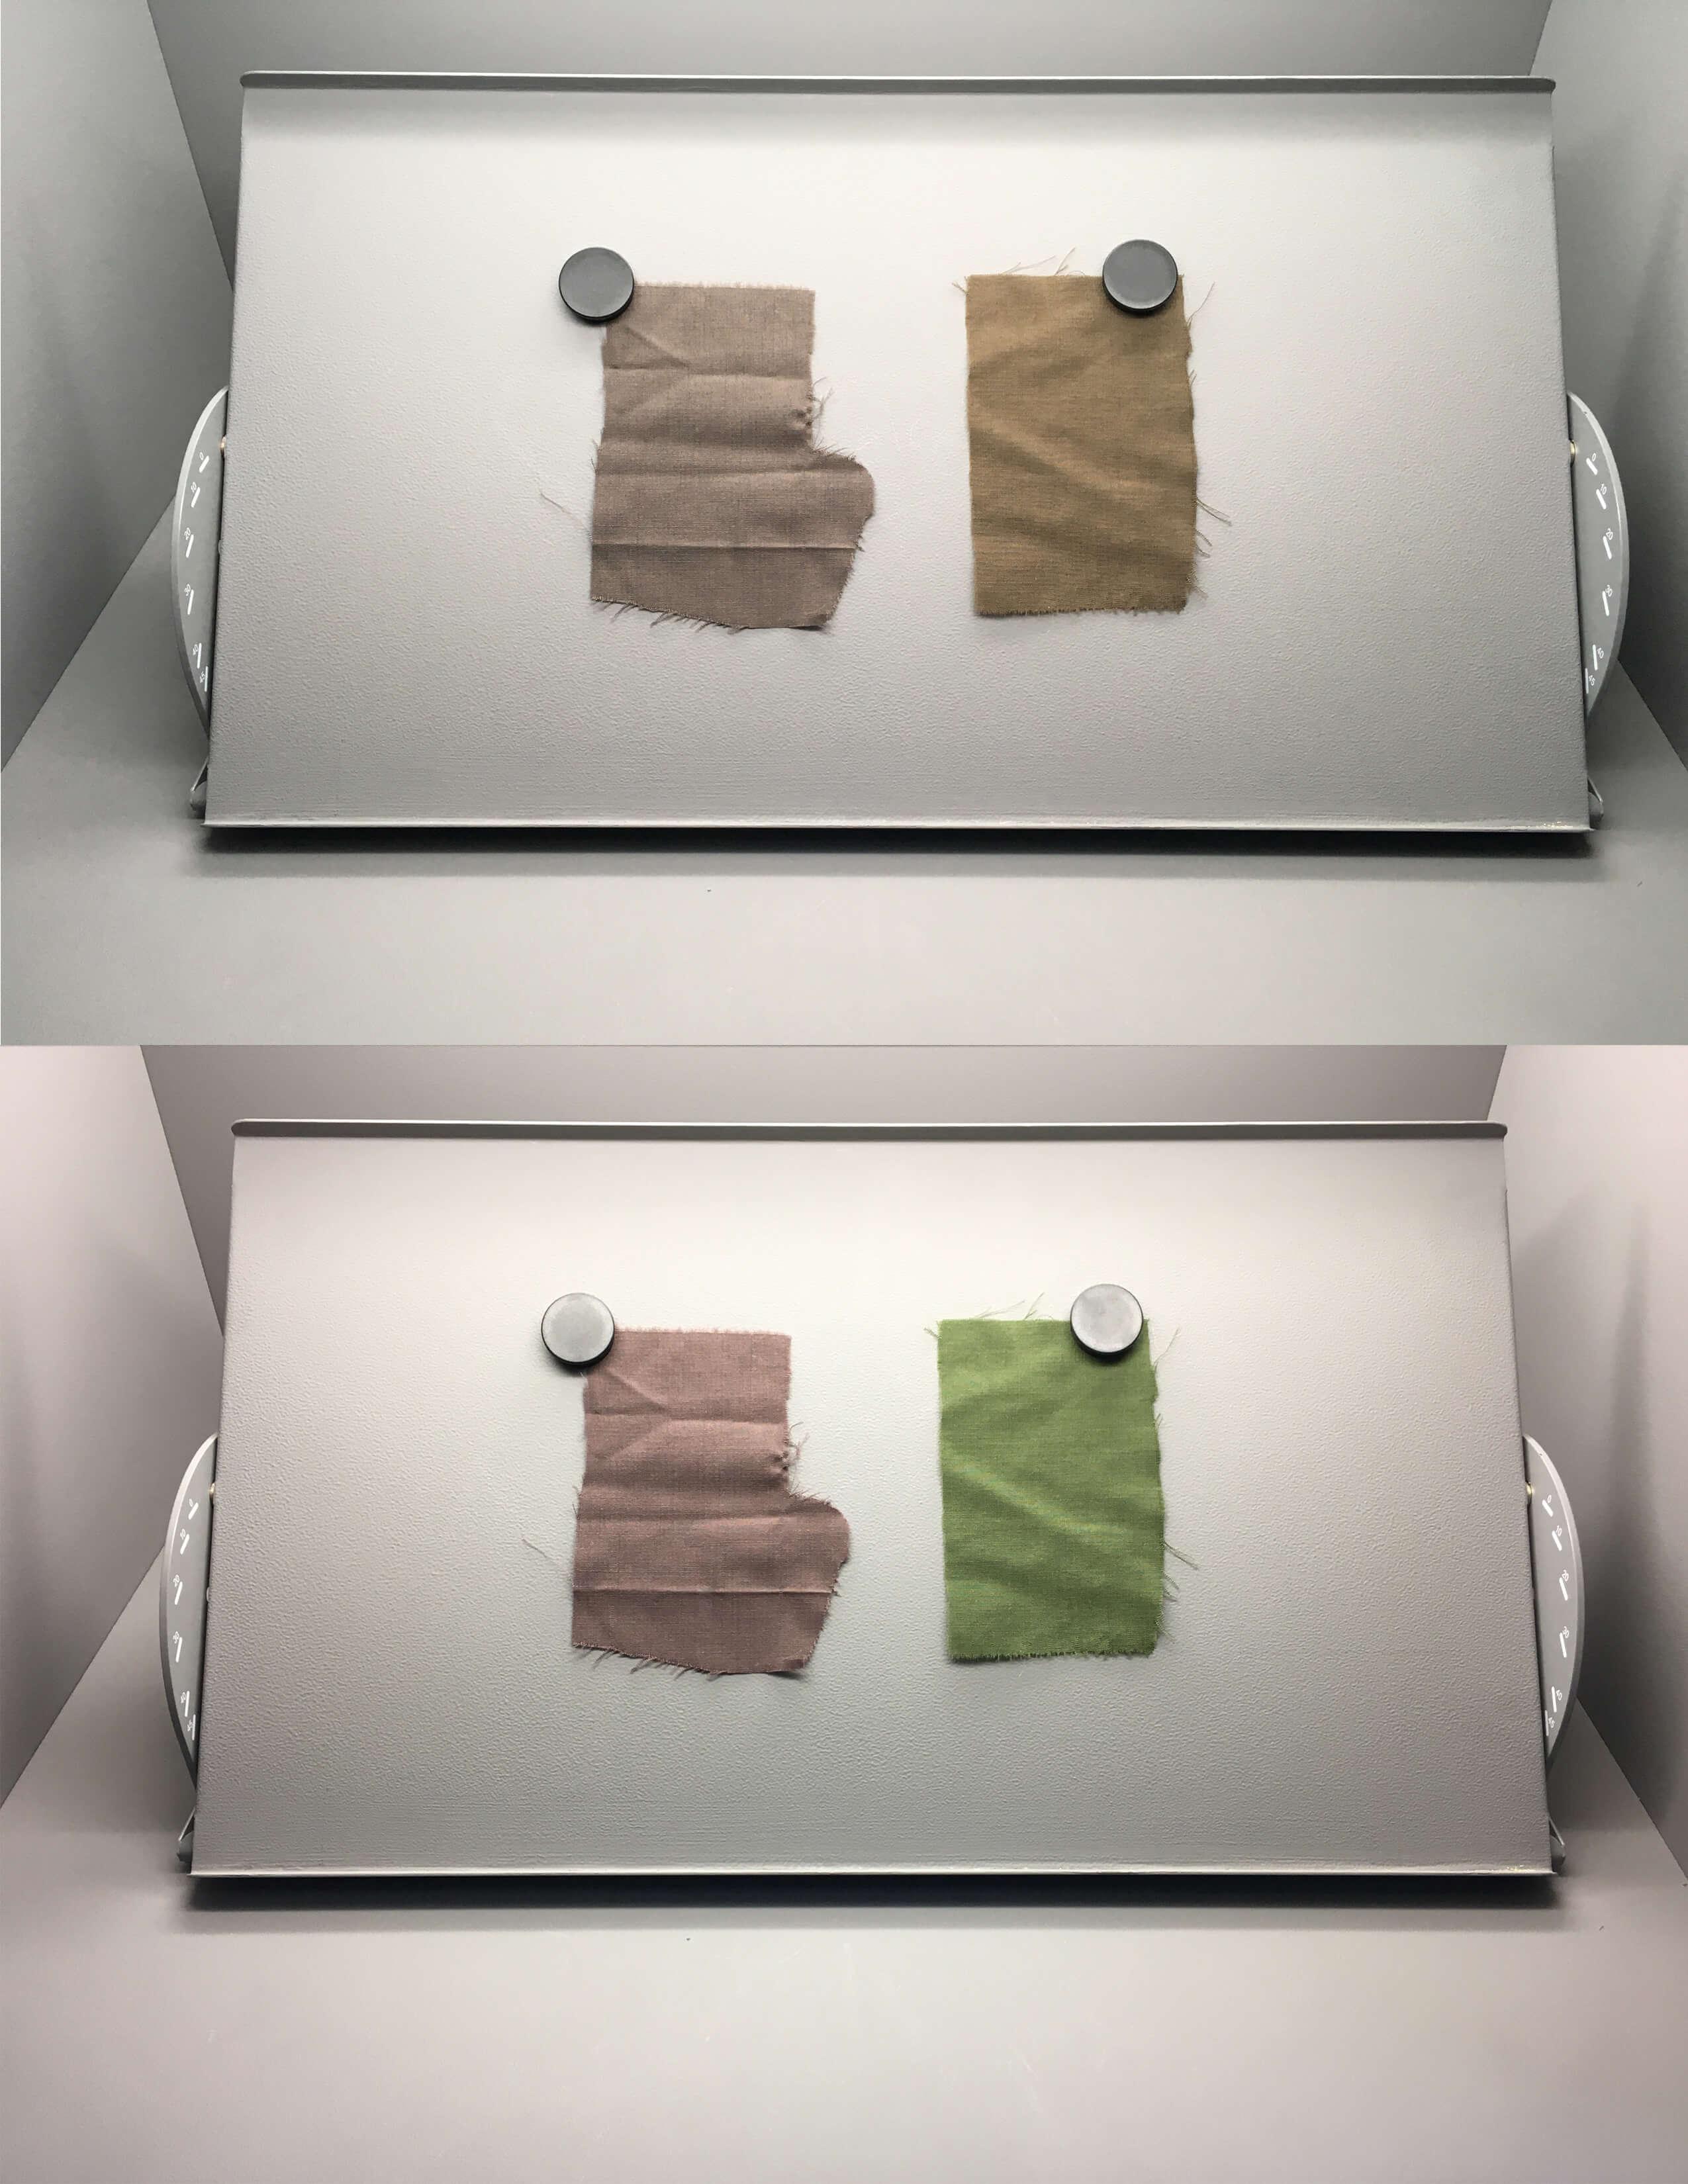 Colour assessment under VeriVide's Light Cabinet